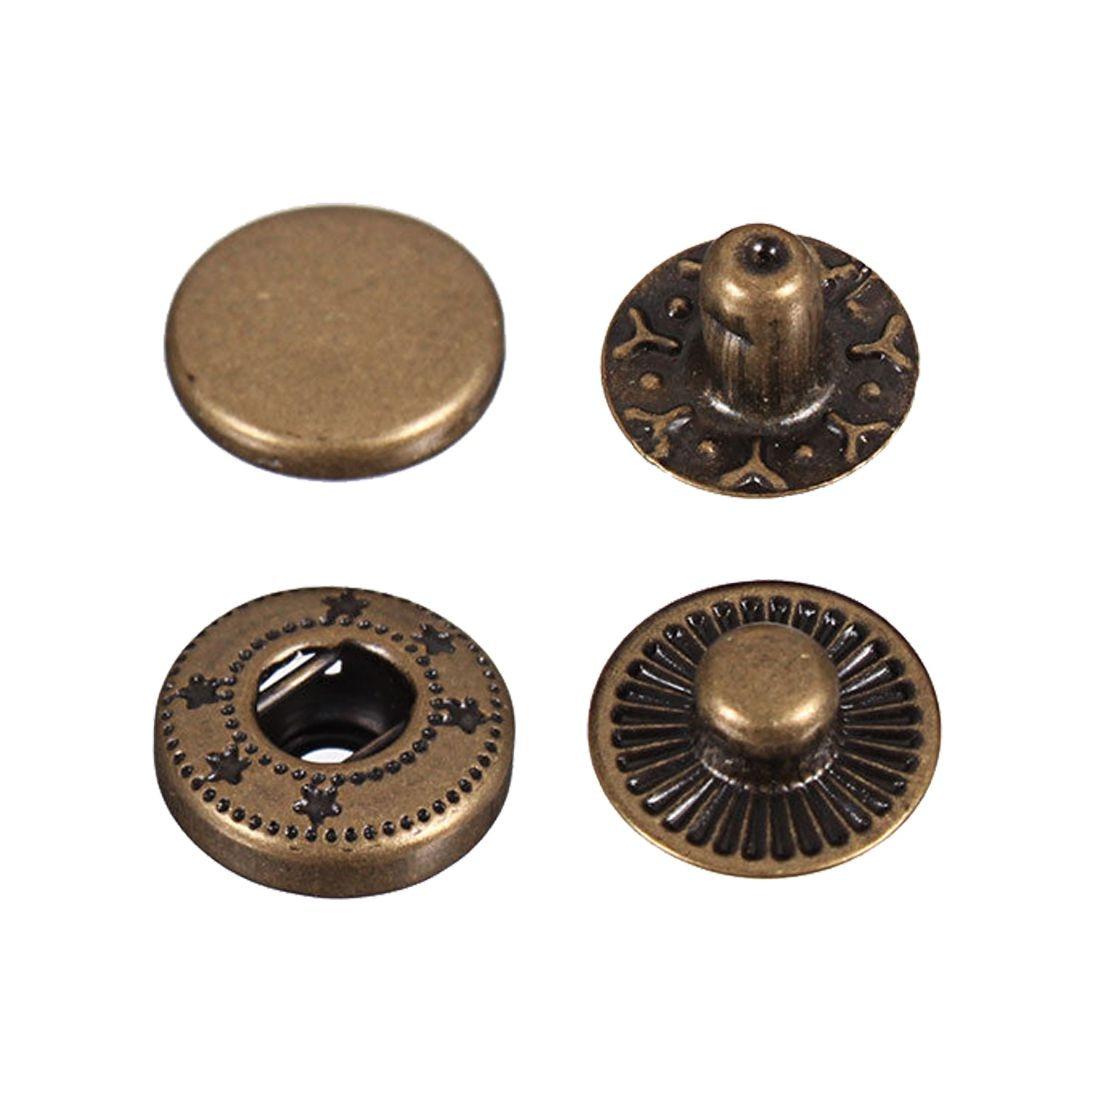 Botón de presión sin botones AIMA 15X 17mm para color bronce